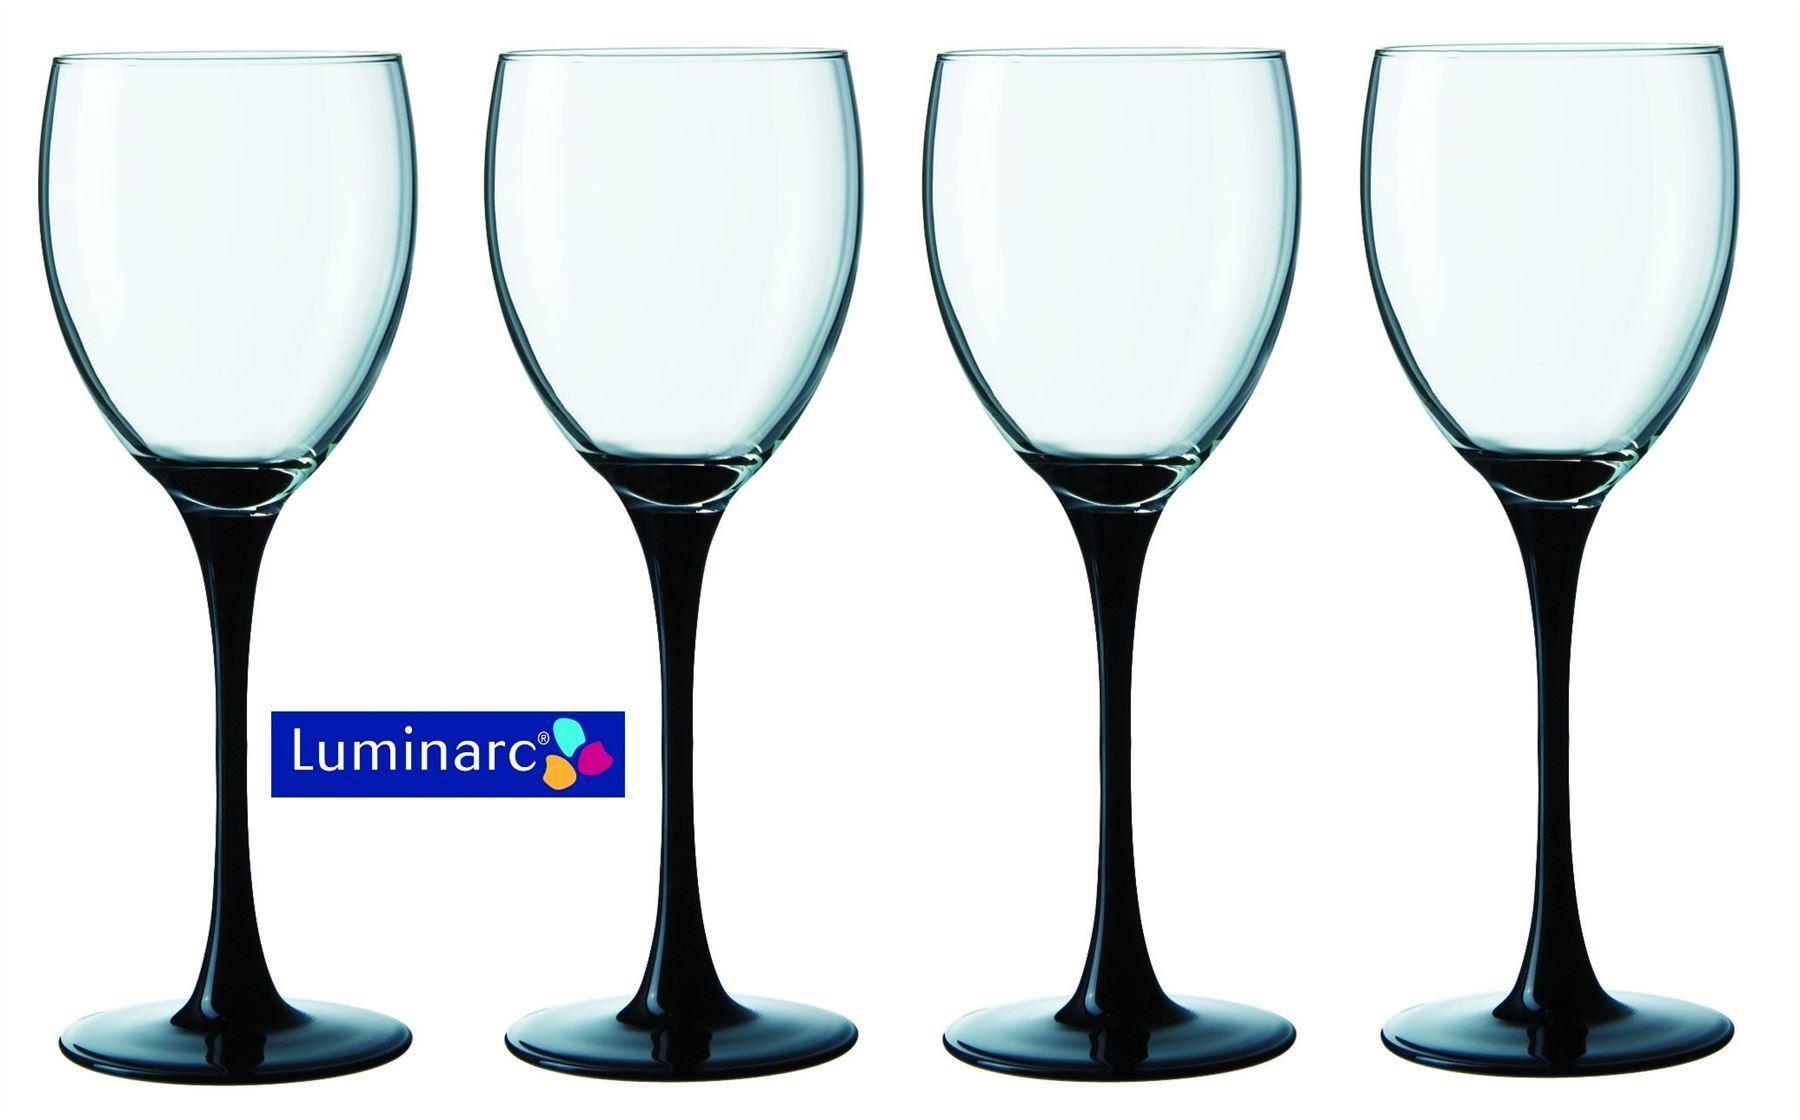 Luminarc Domino Set Of 4 Wine Glasses With Black Stem